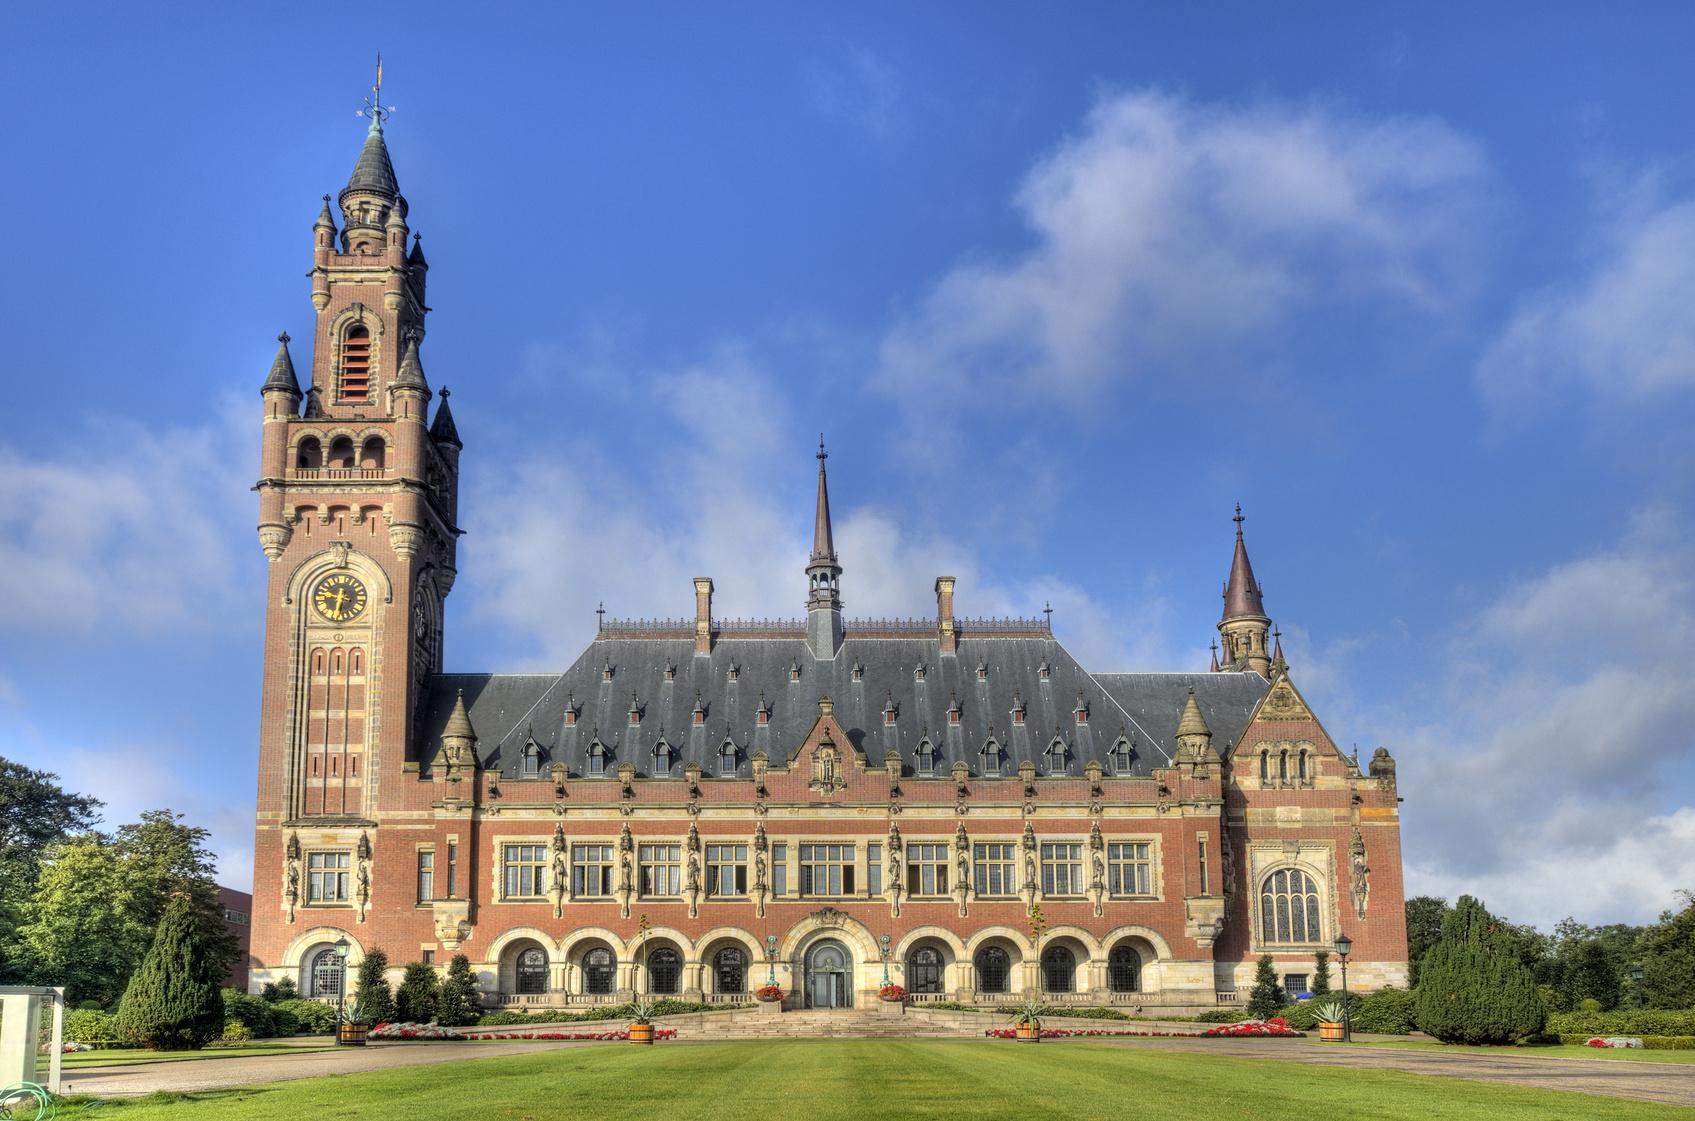 Former KLA senior commander summoned in The Hague for questioning